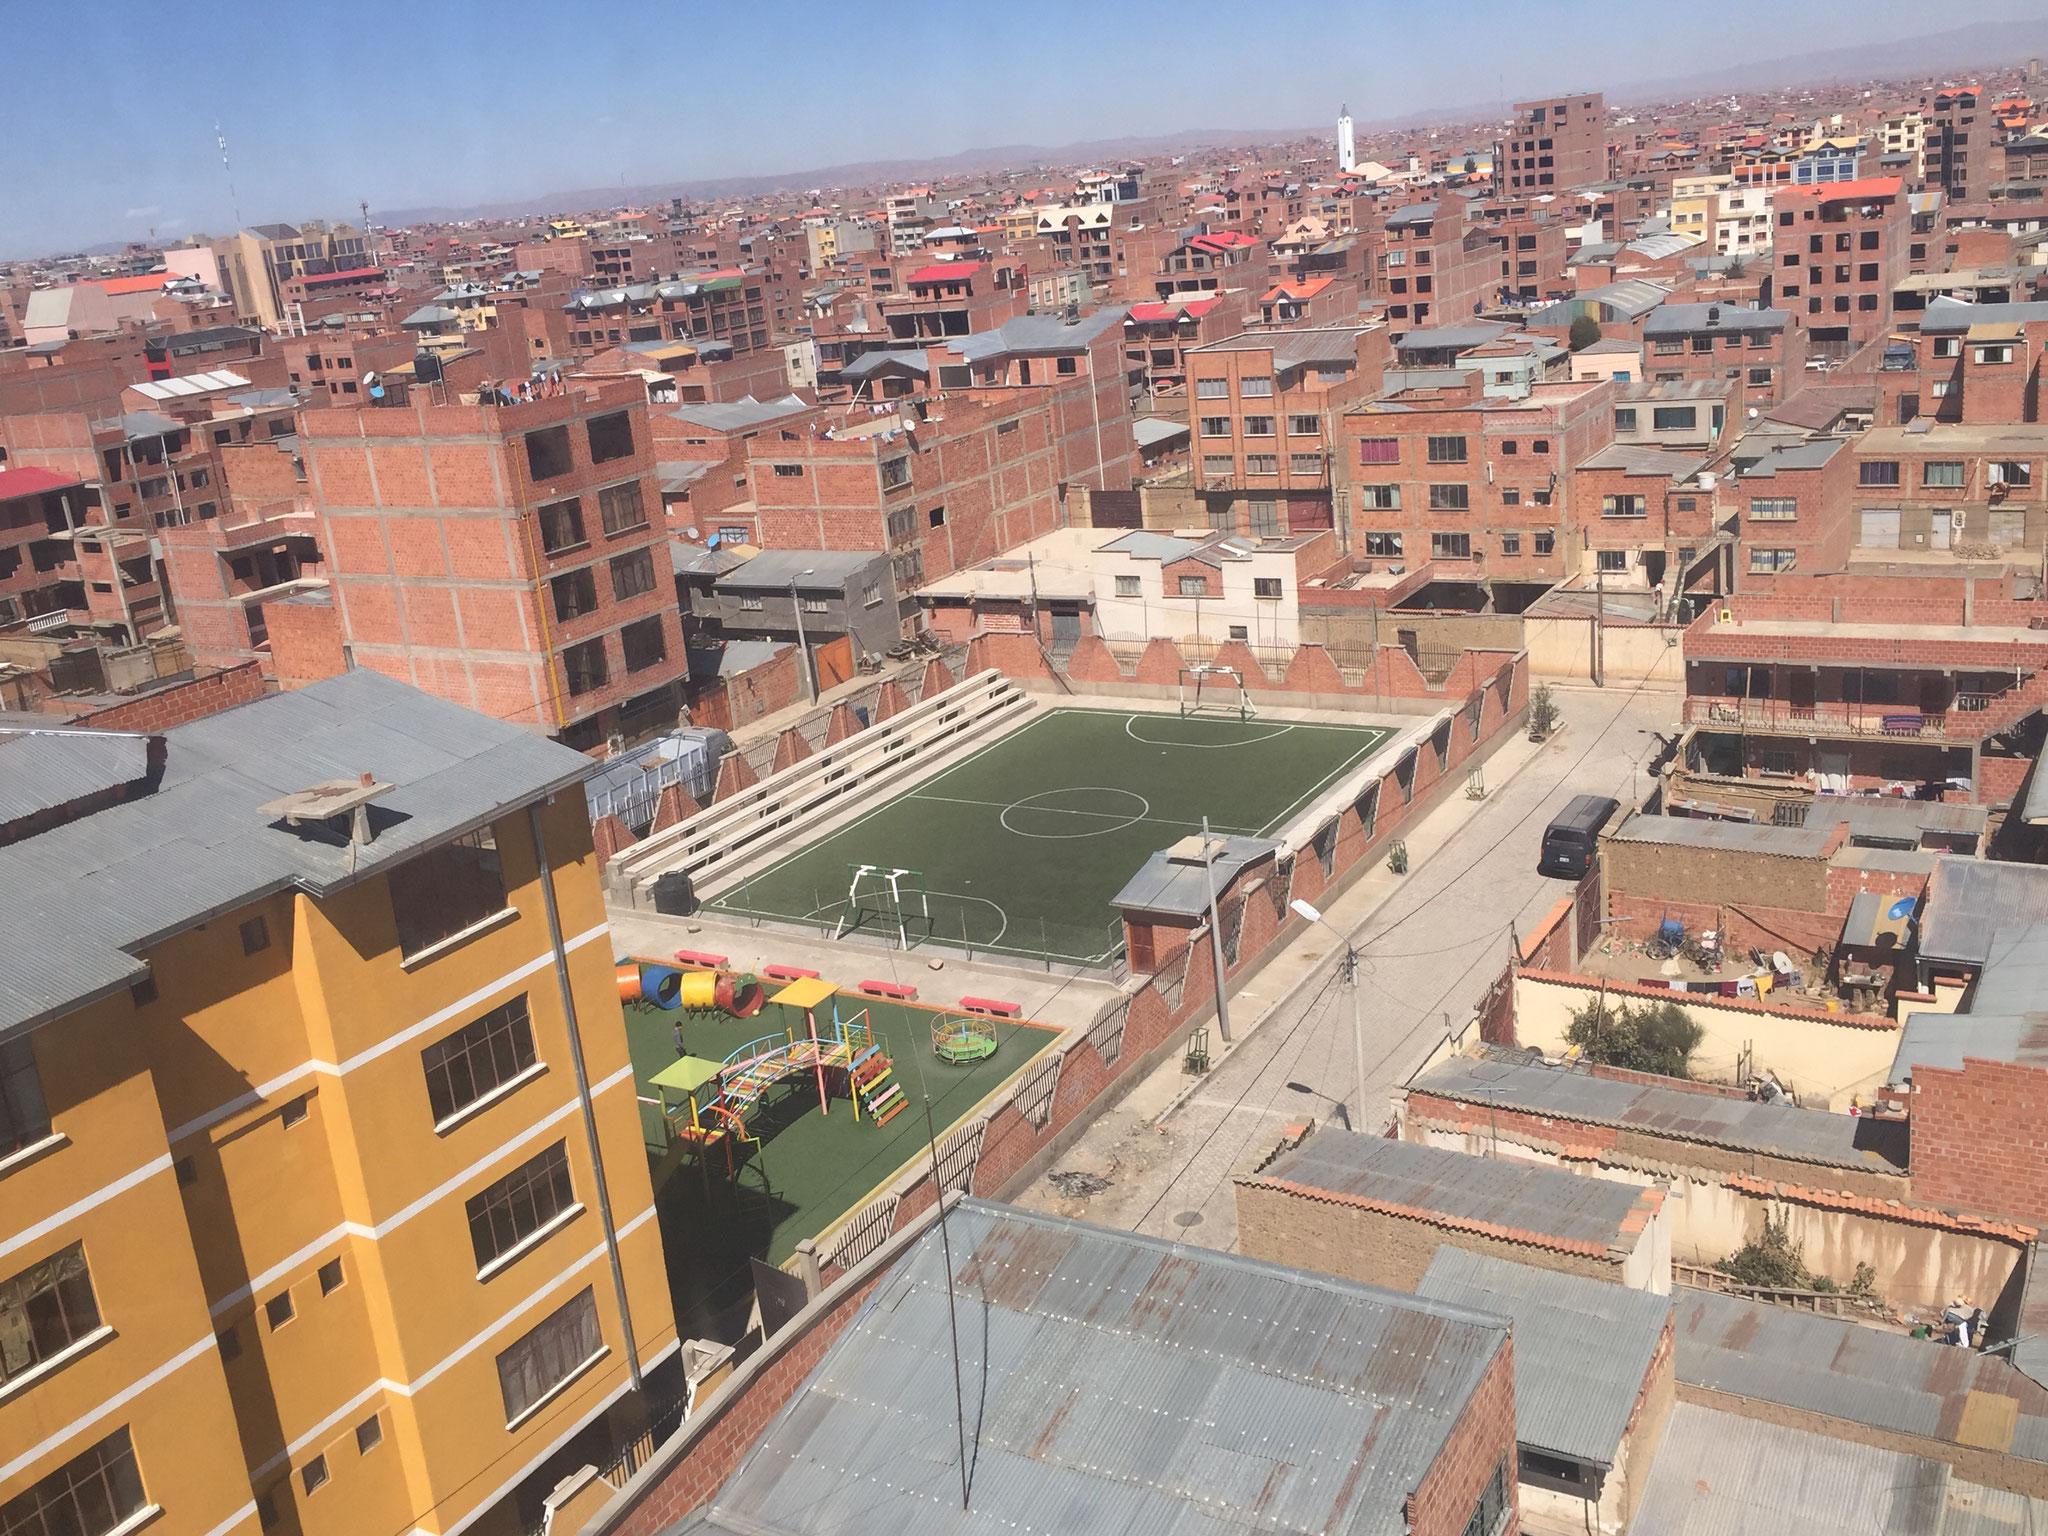 Mitten in El Alto Fussballplatz